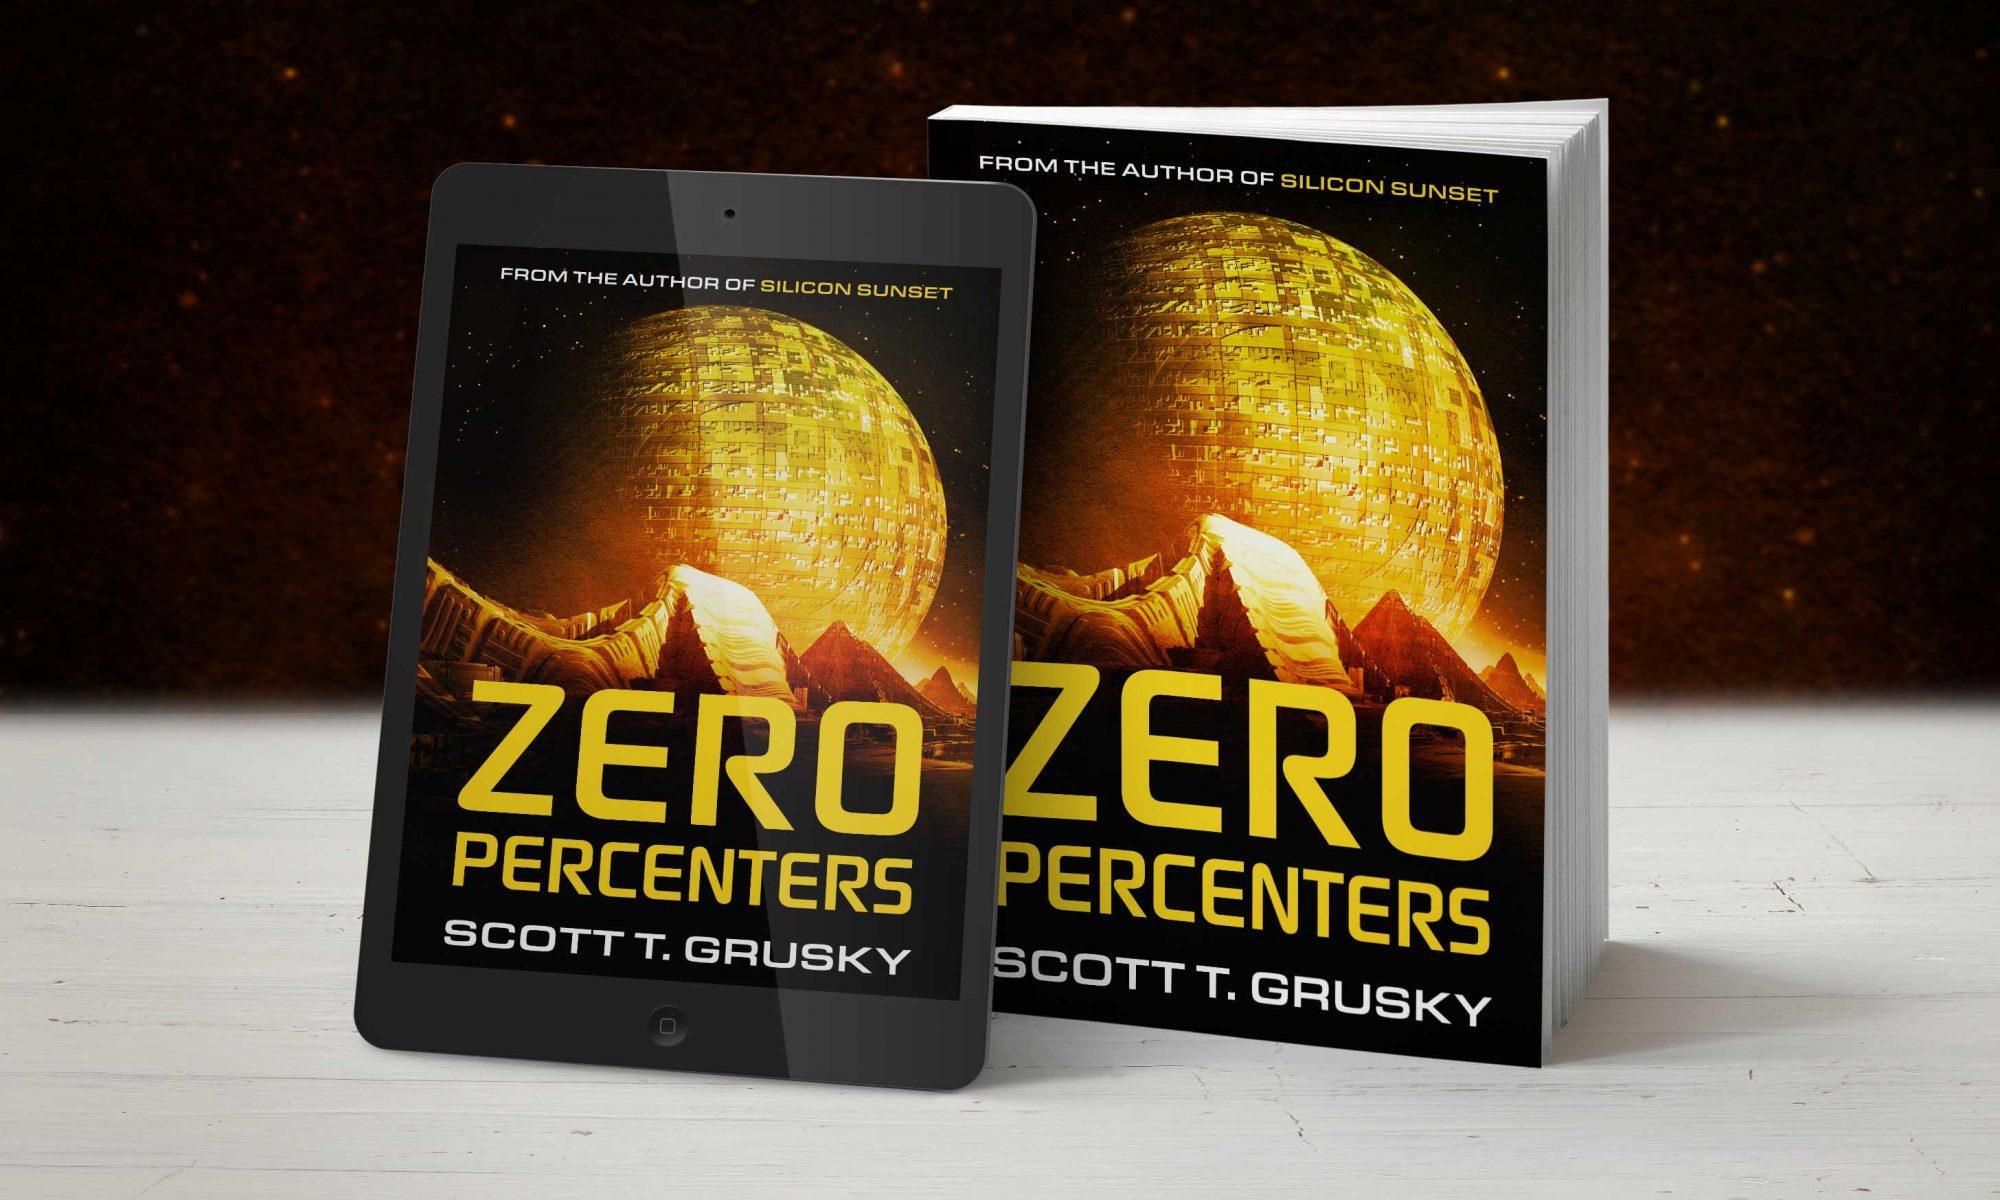 Zero Percenters by Scott T. Grusky